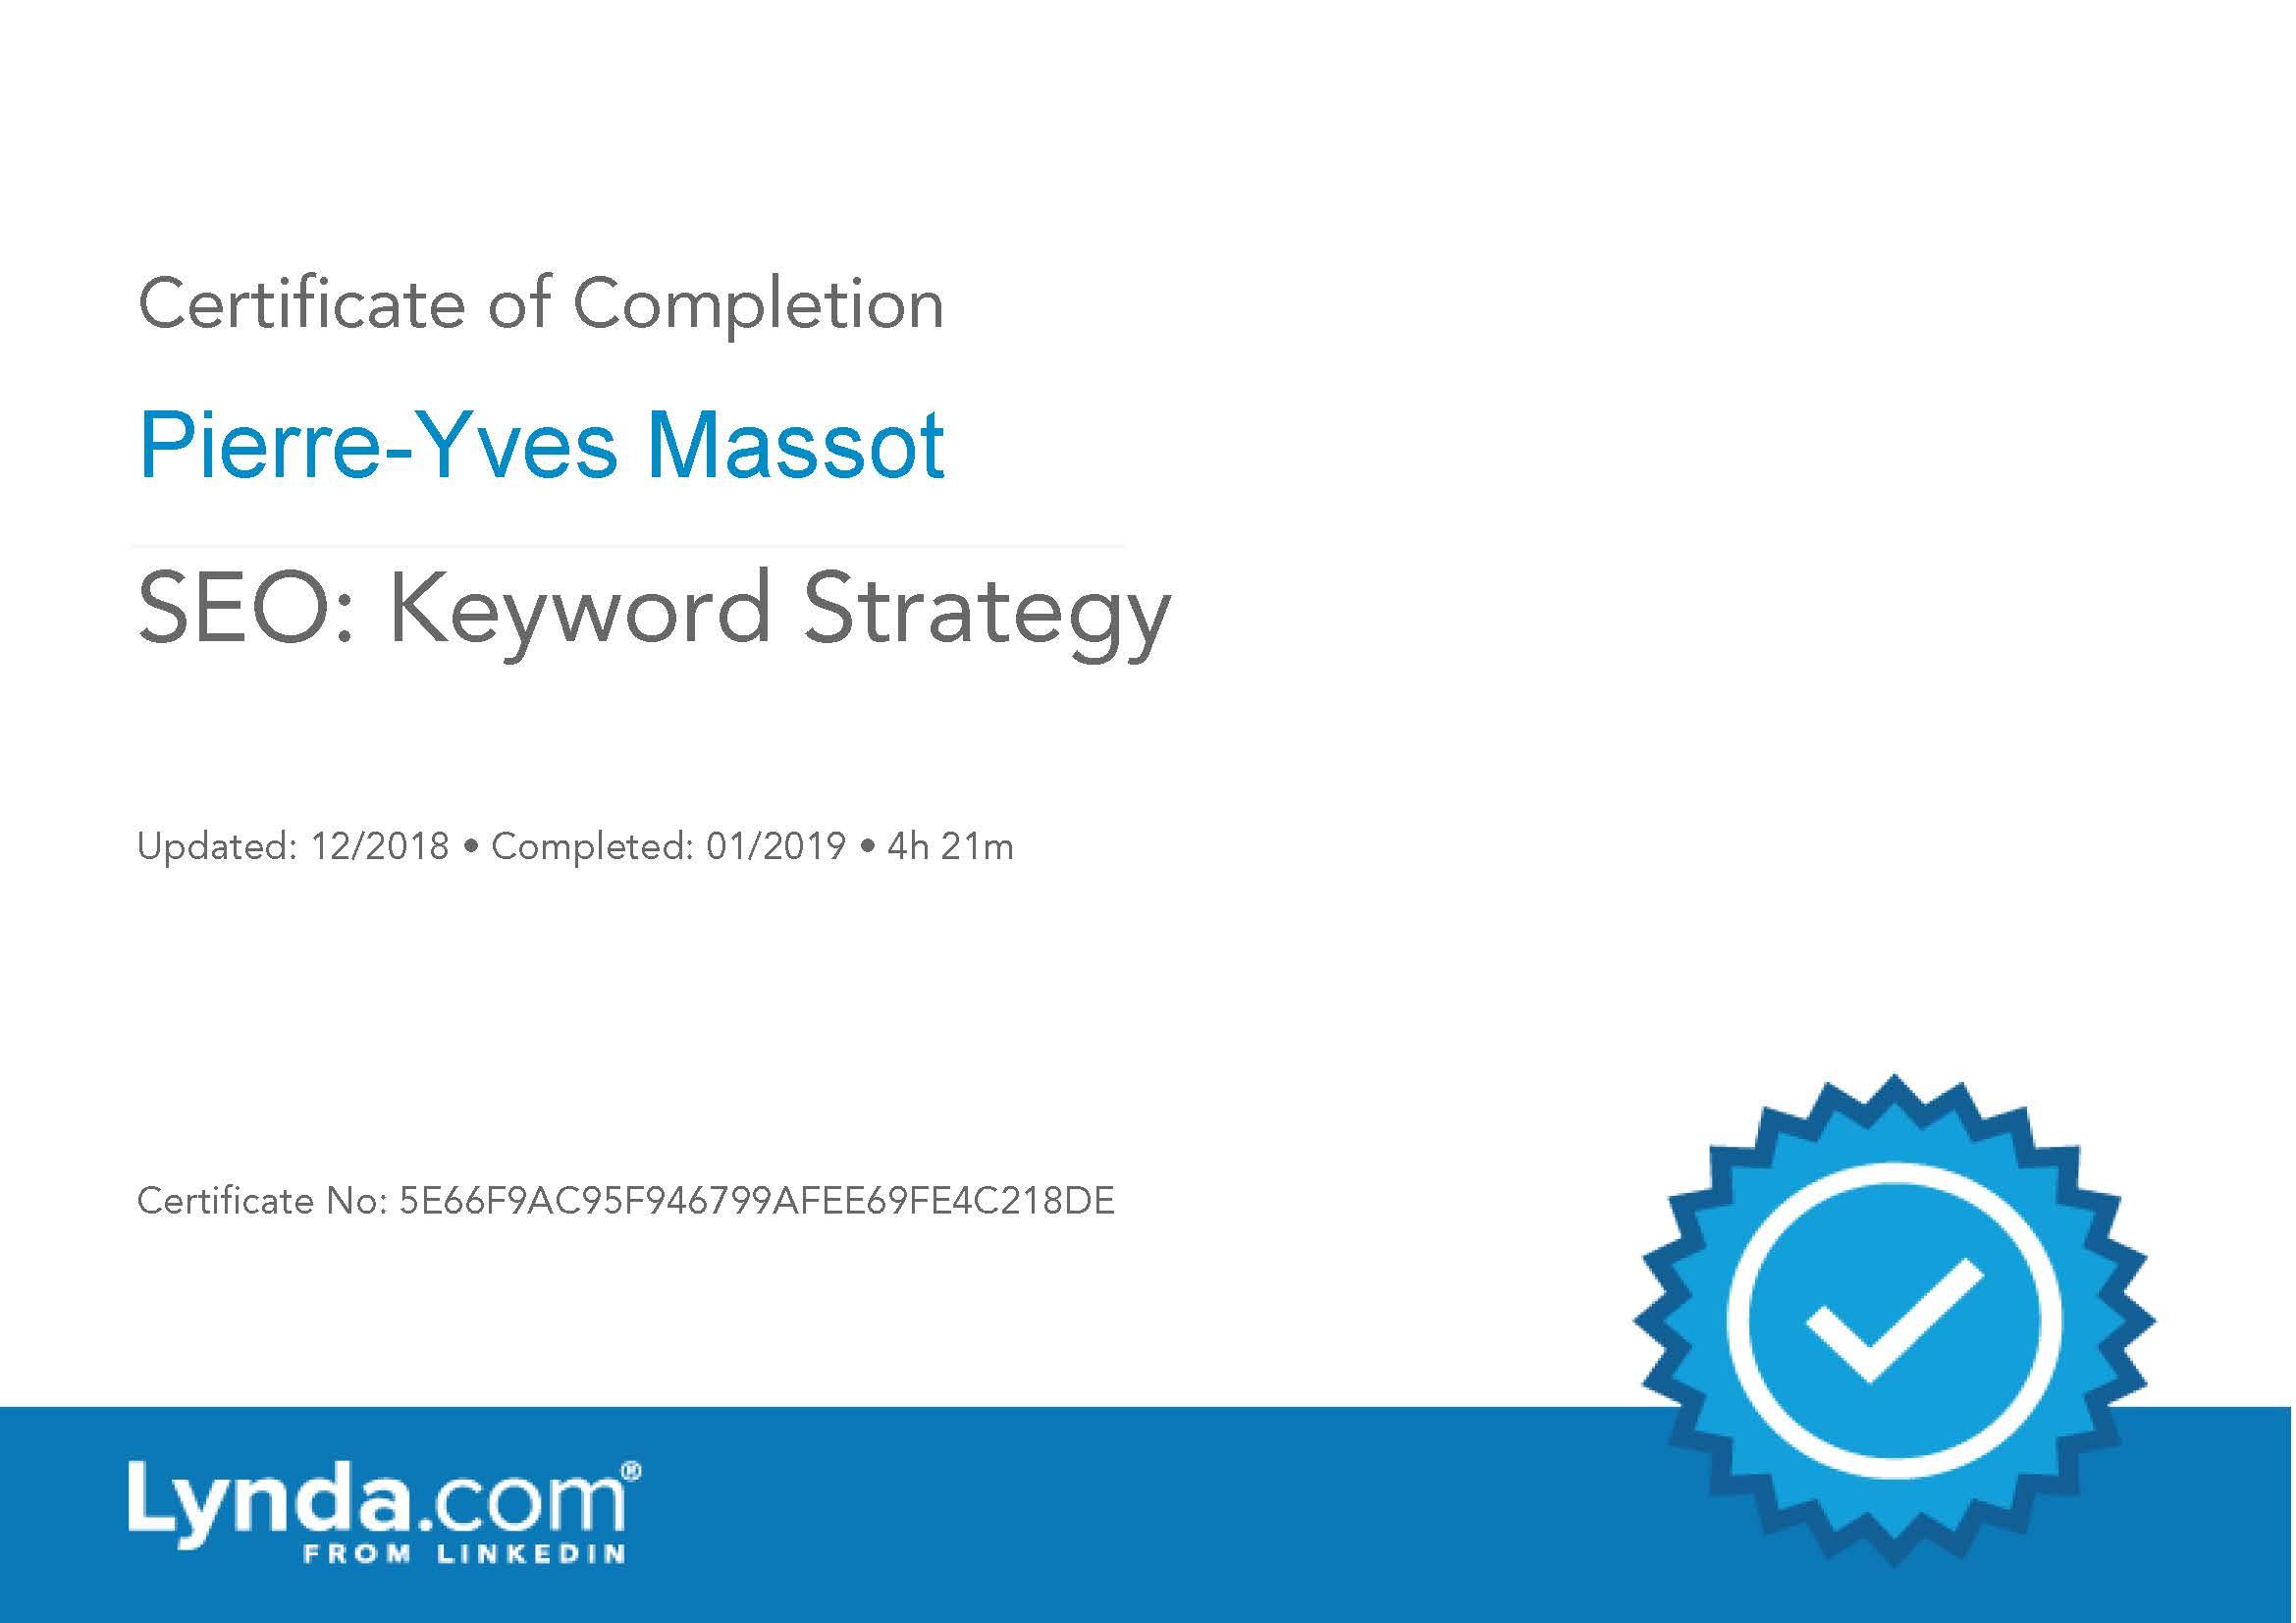 SEO_KeywordStrategy_CertificateOfCompletion.jpg